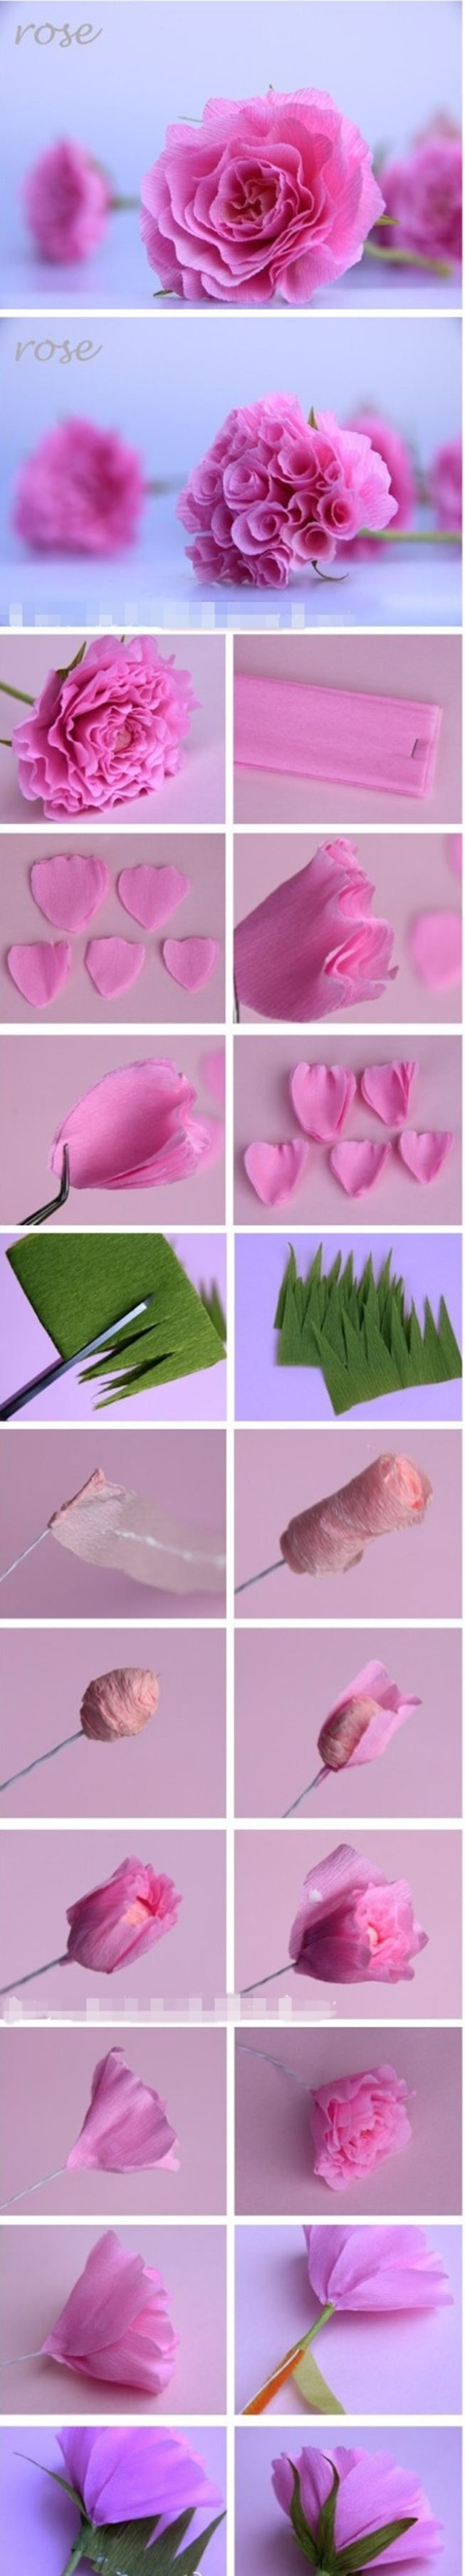 pink paper rose m Wonderful DIY pink paper rose